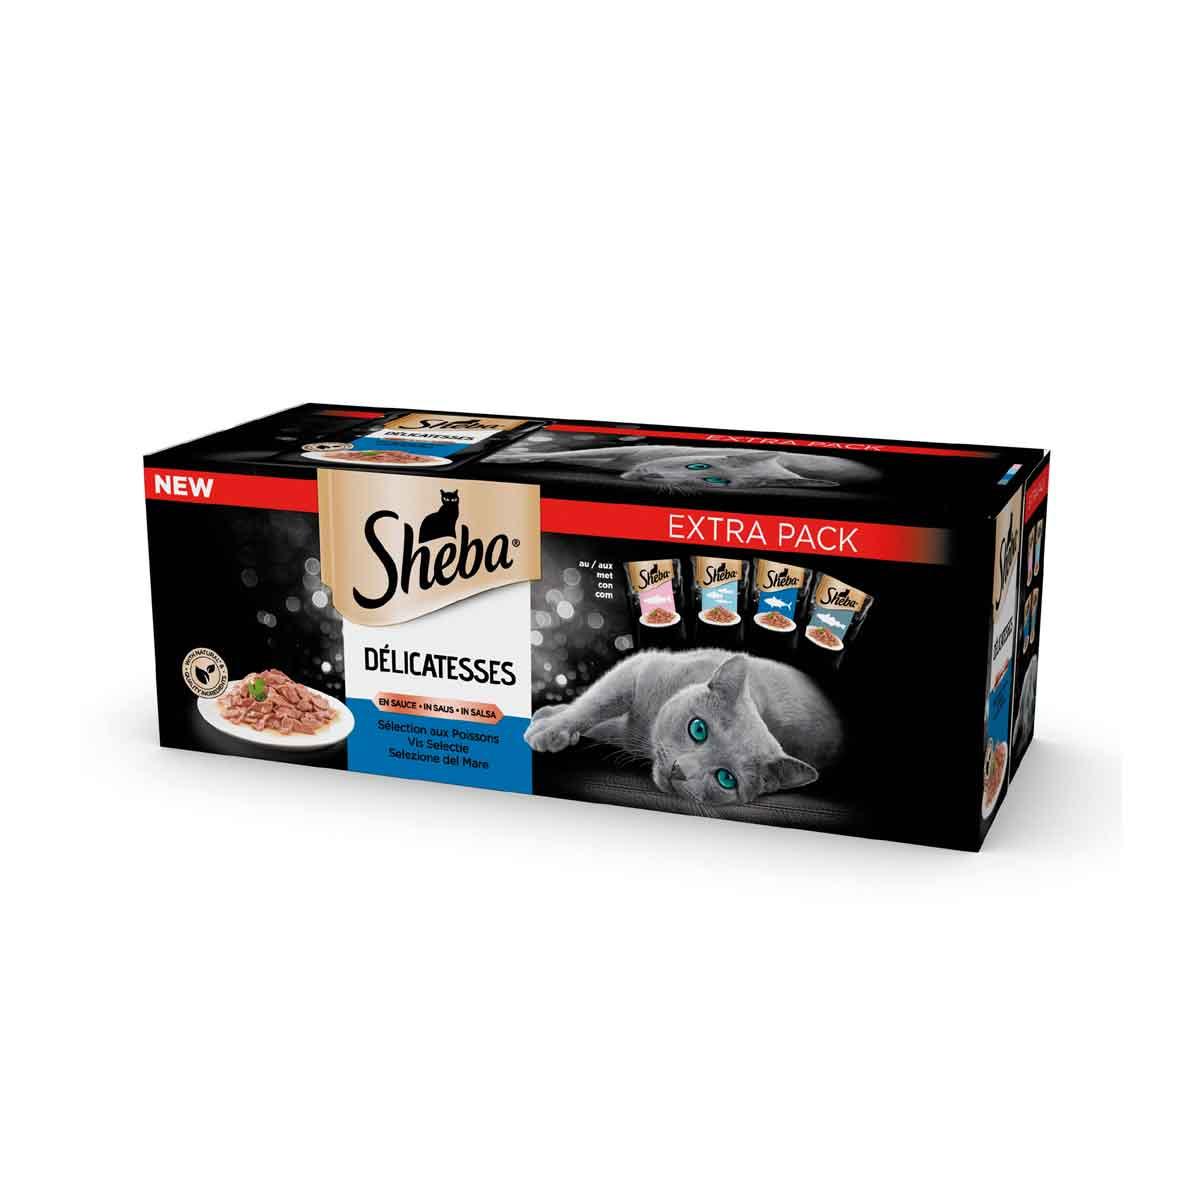 Sheba Delicatessen Multipack